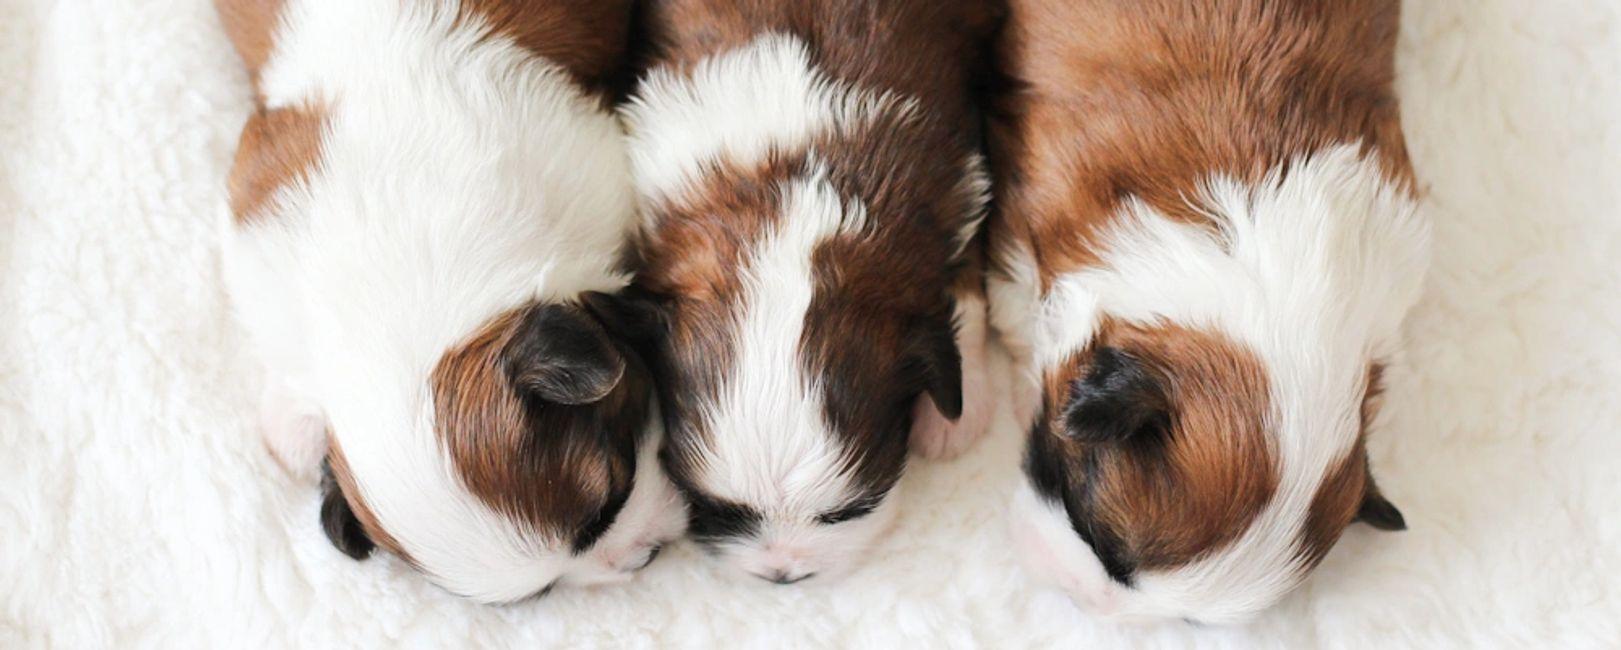 StonyRidge Puppies for Sale: Shichon | Shihpoo | Teddy Bear